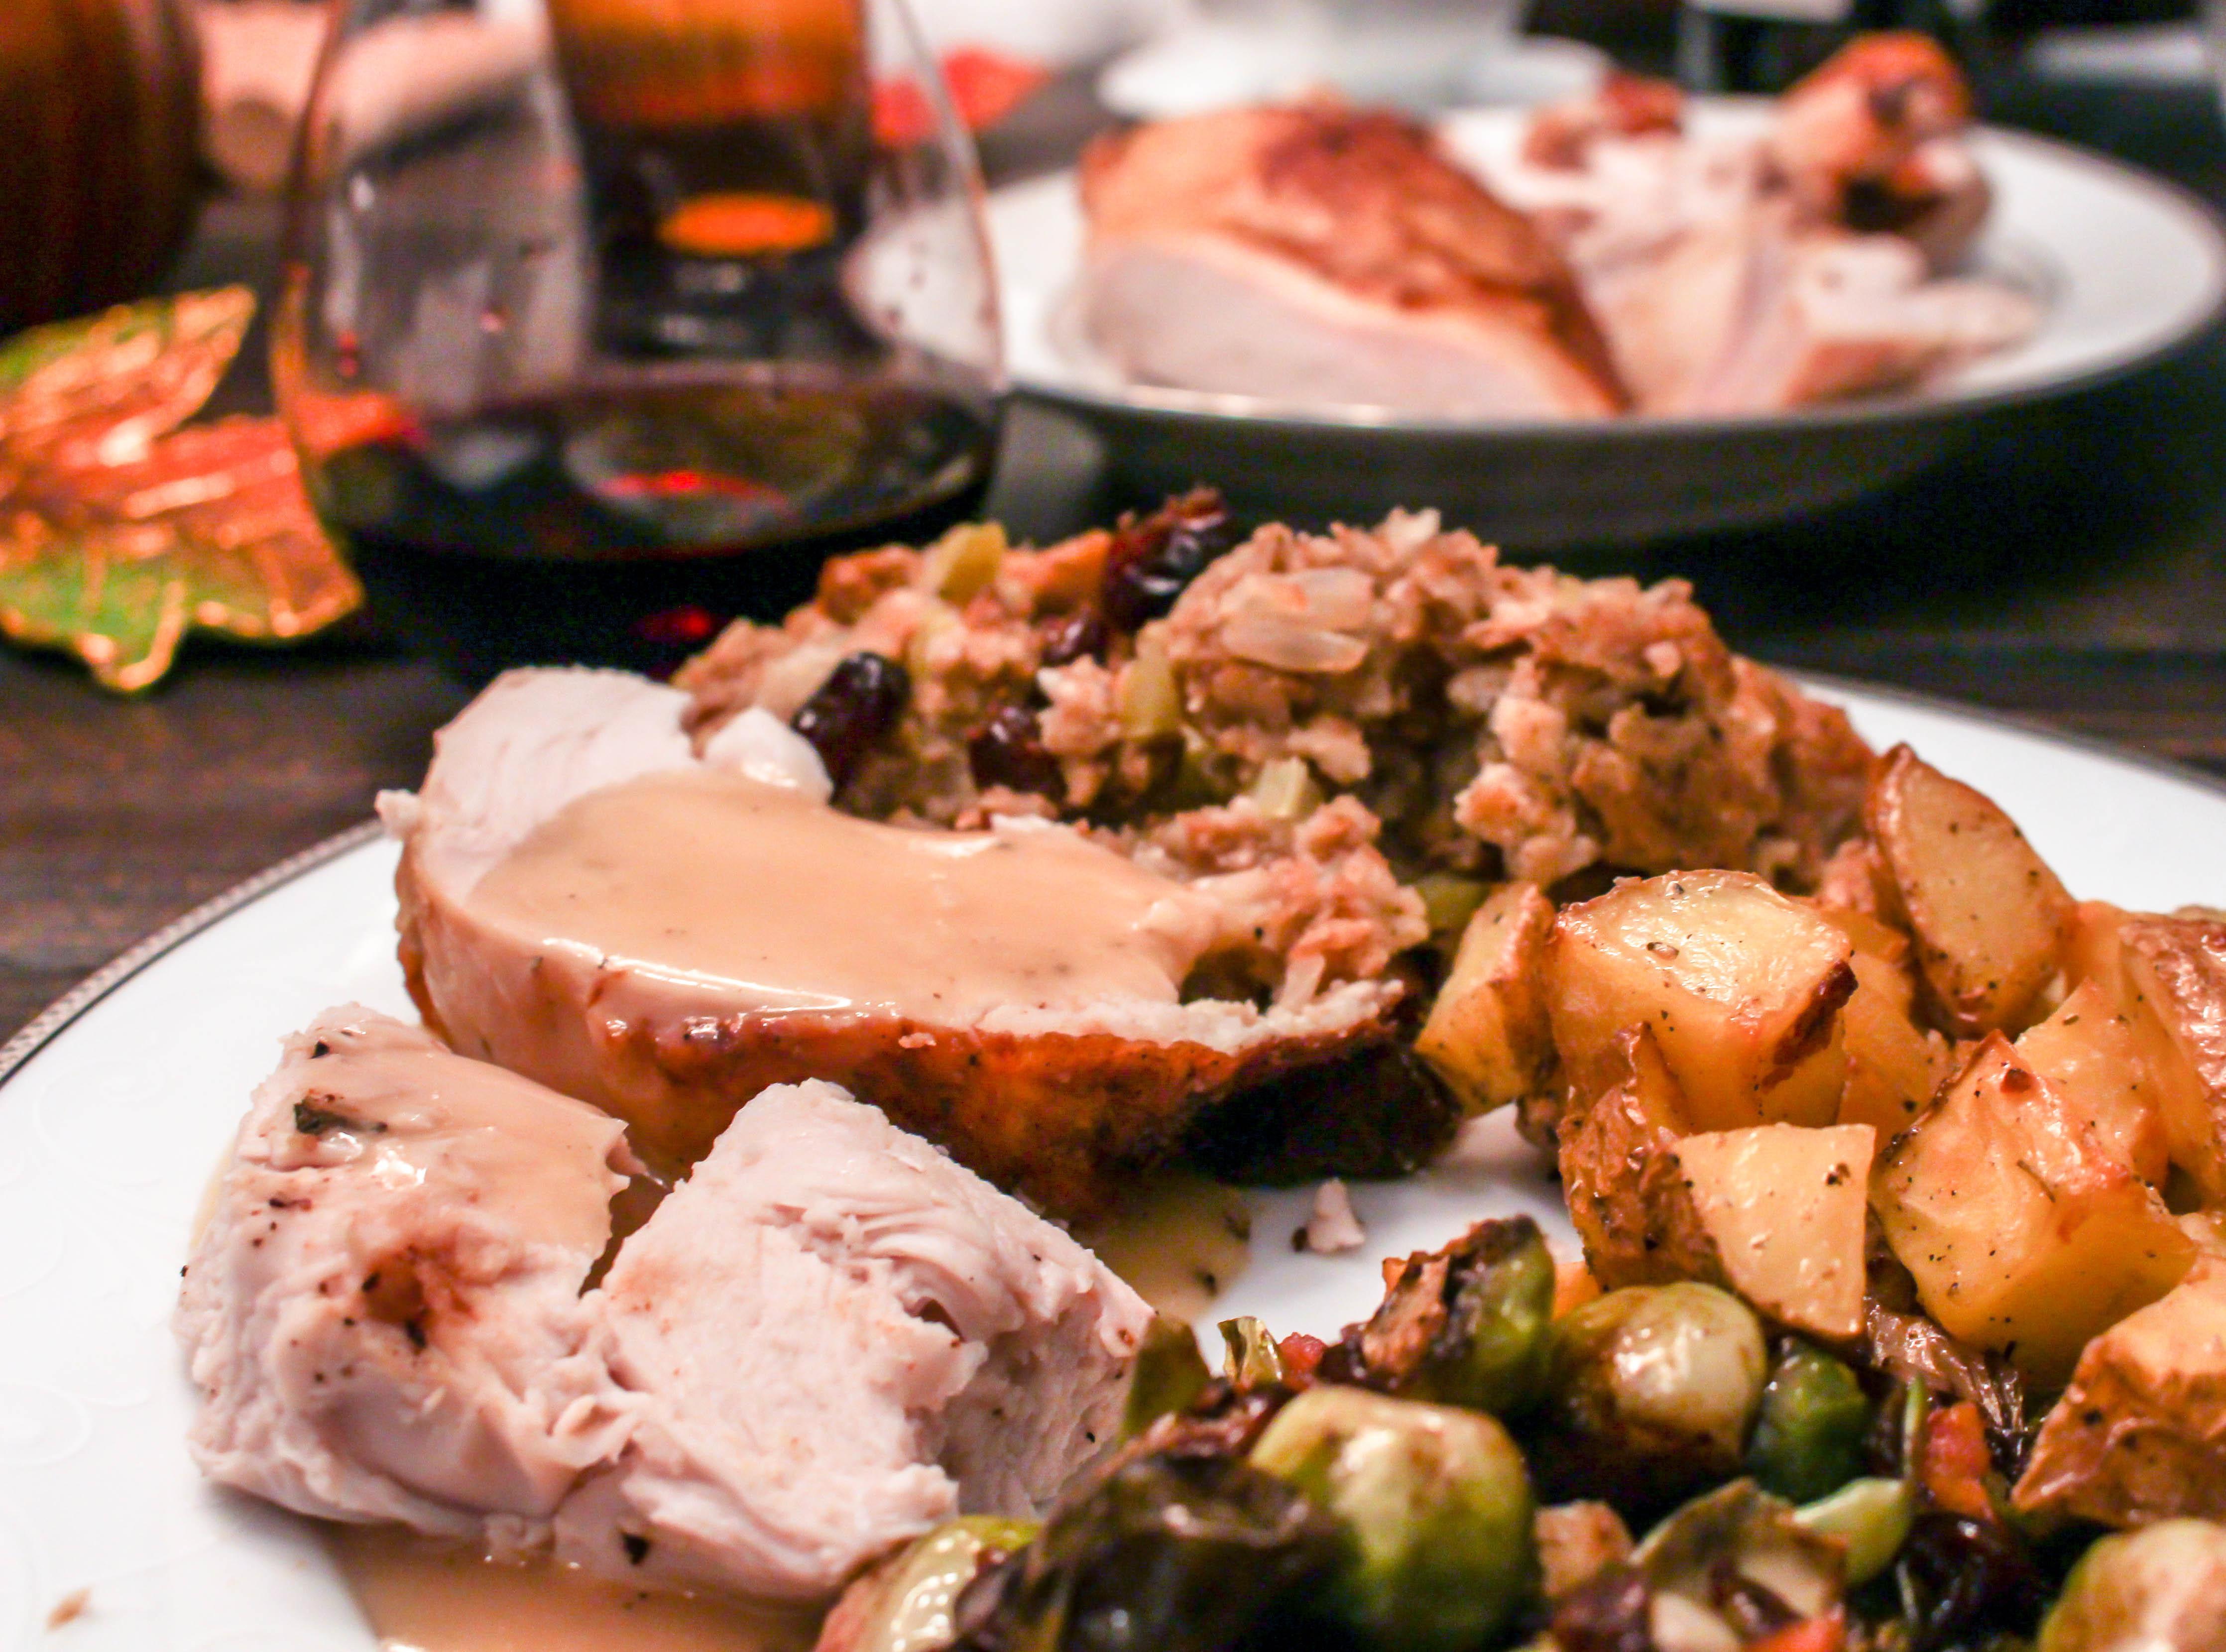 Brine For Turkey Breast  Brined & Roasted Turkey Breast with White Wine Truffle Gravy